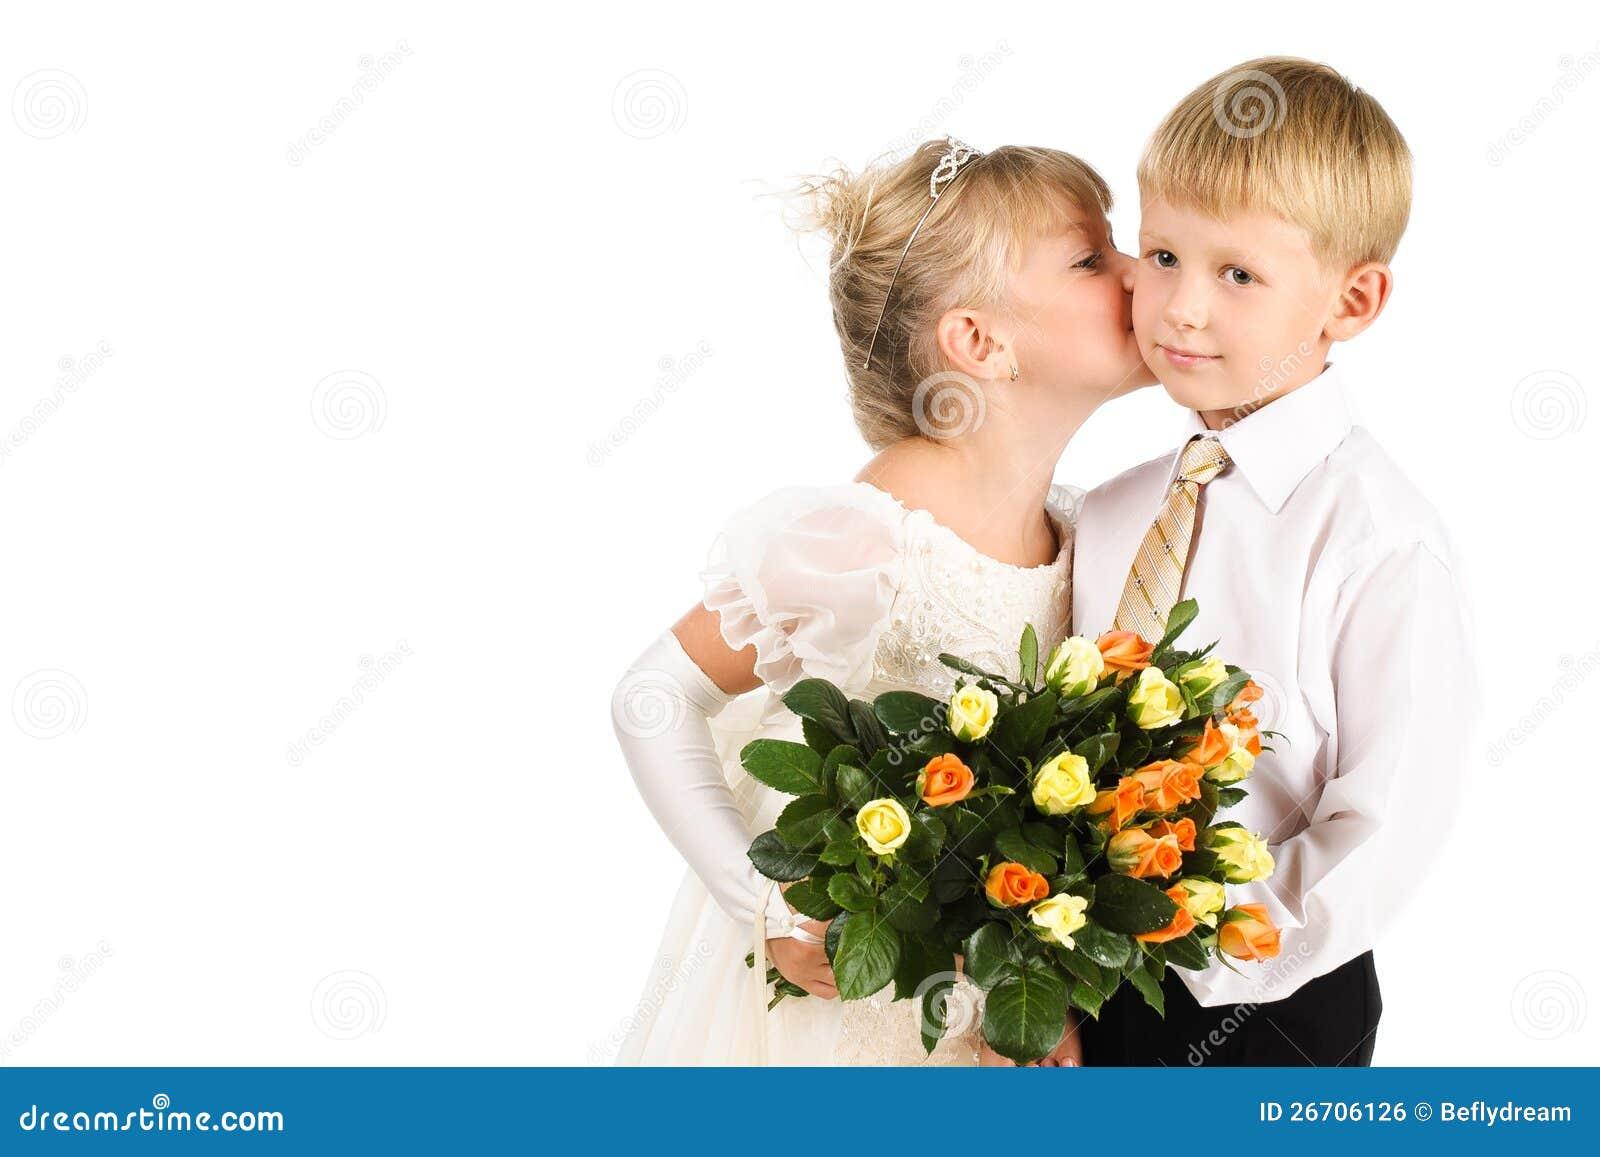 Little Girl Kissing A Boy Formal Studio Shot Stock Photo Image Of